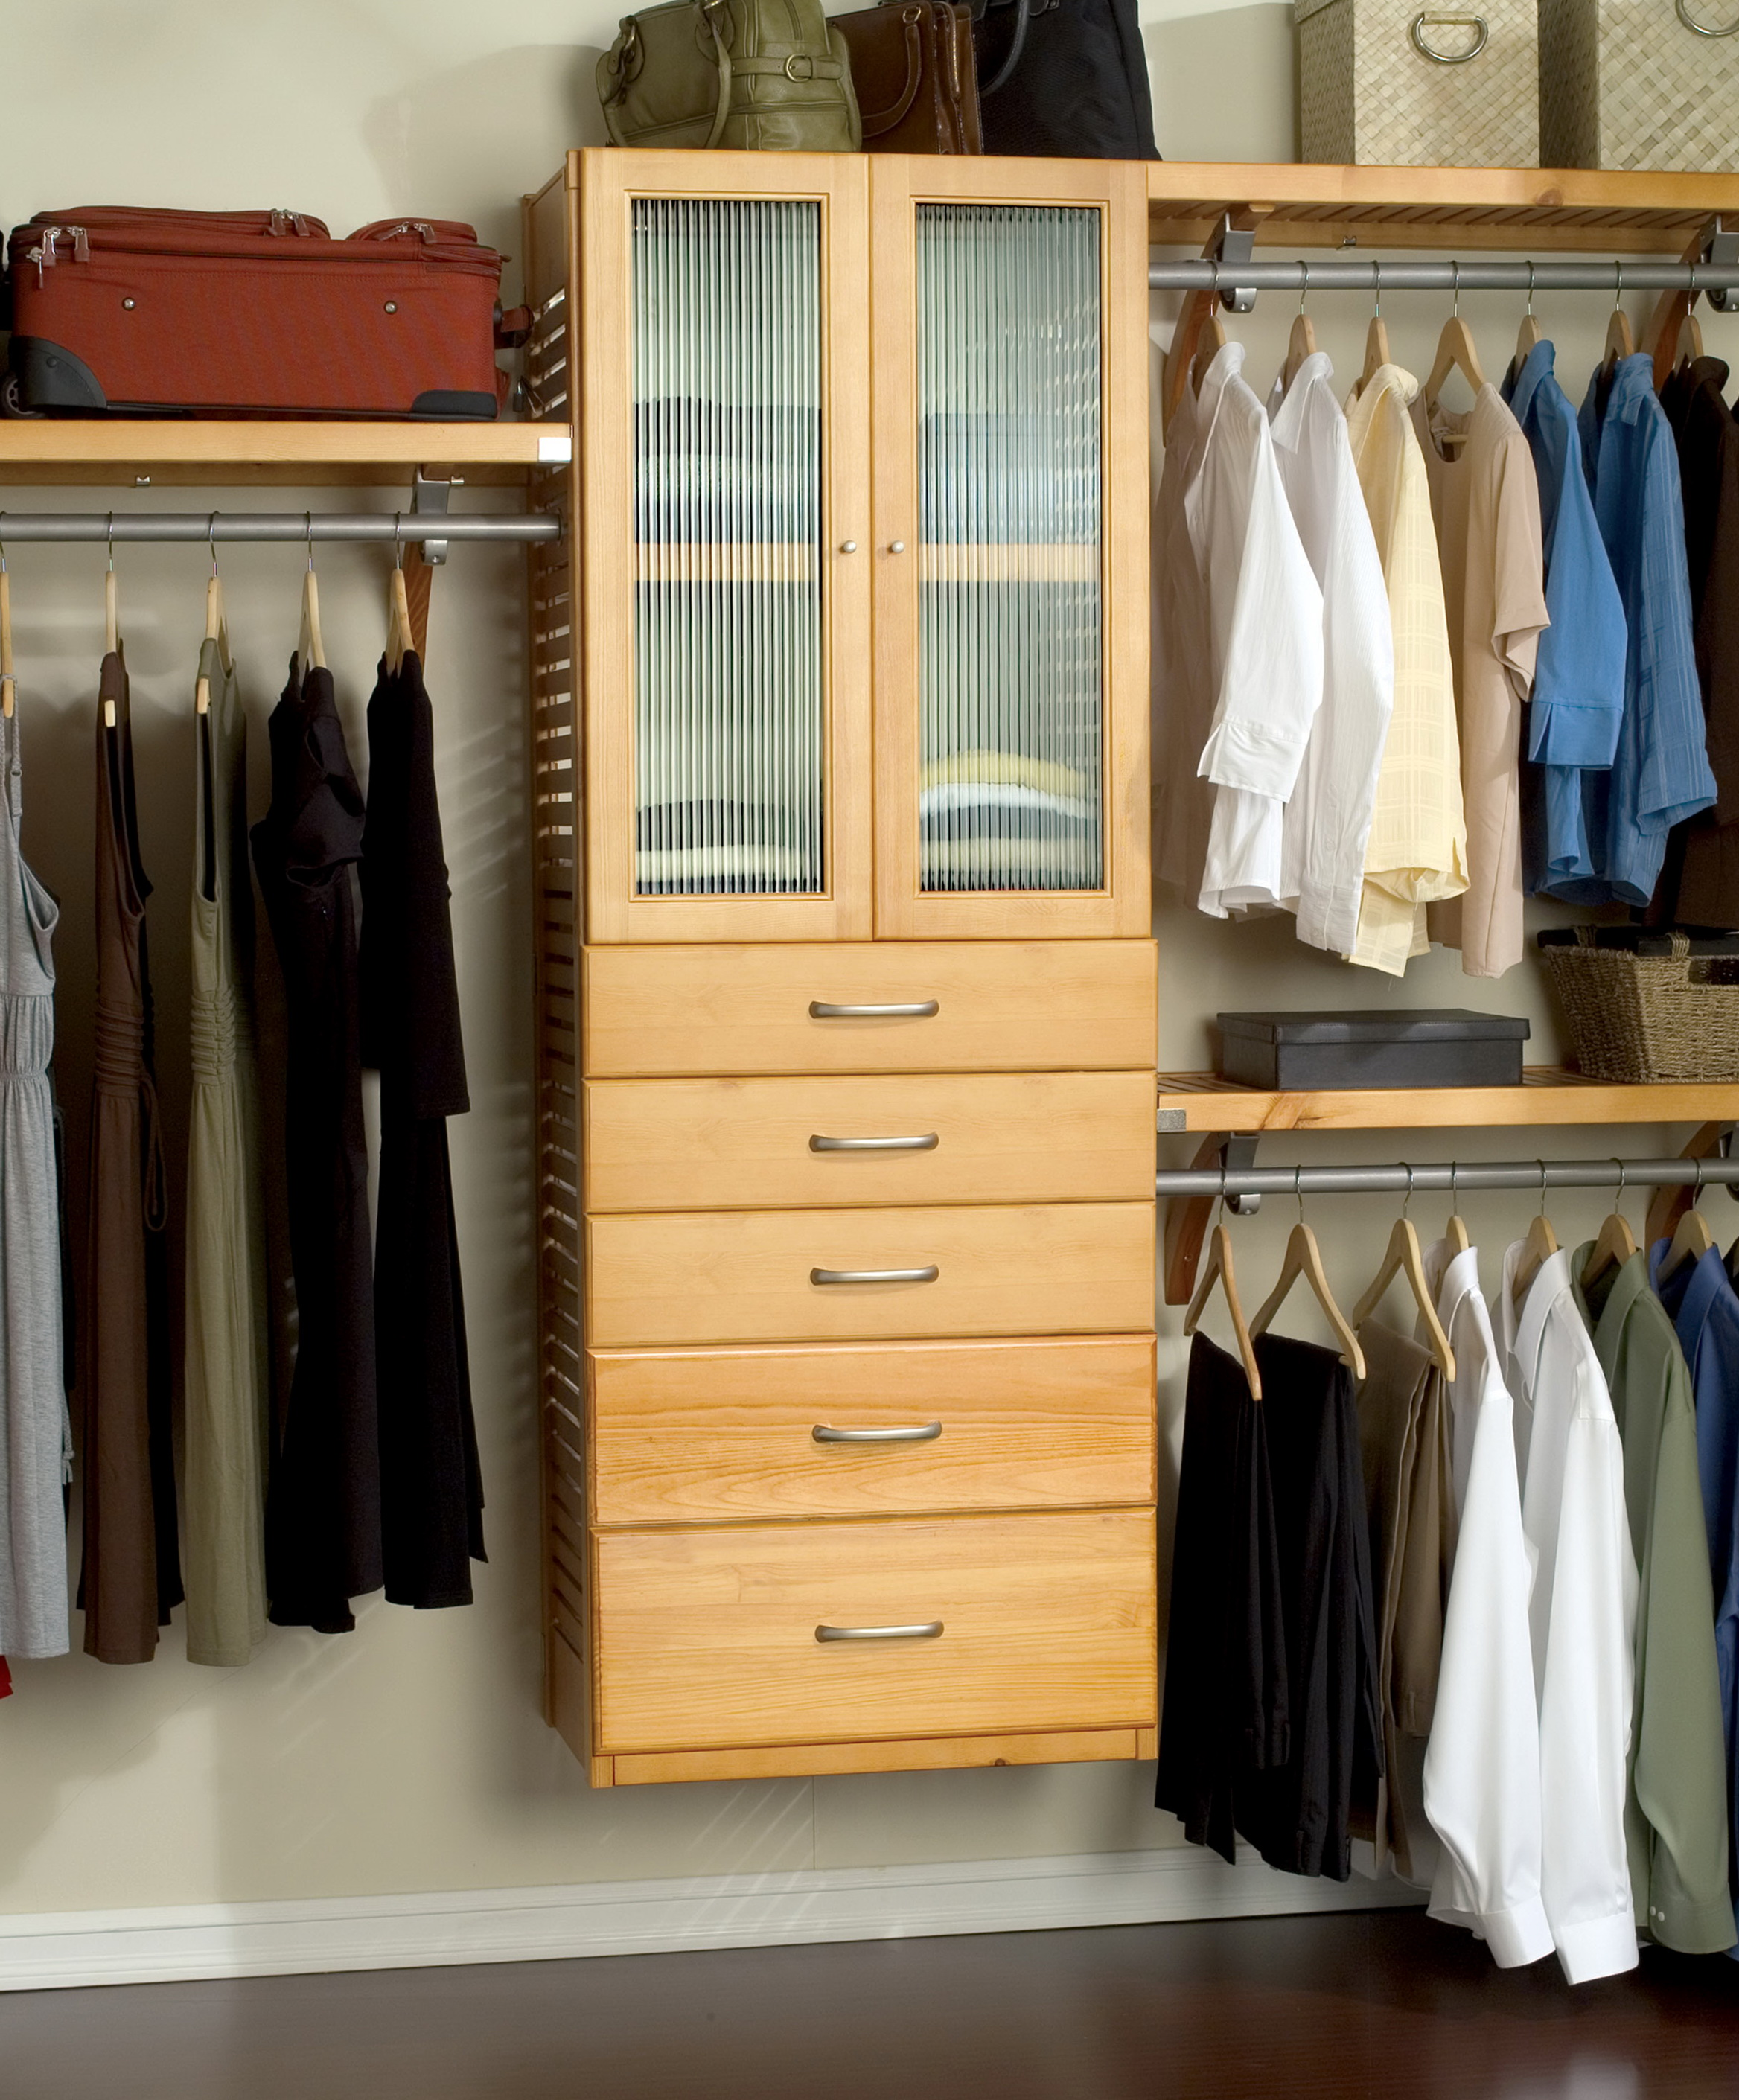 Hanging Closet Organizer Ideas